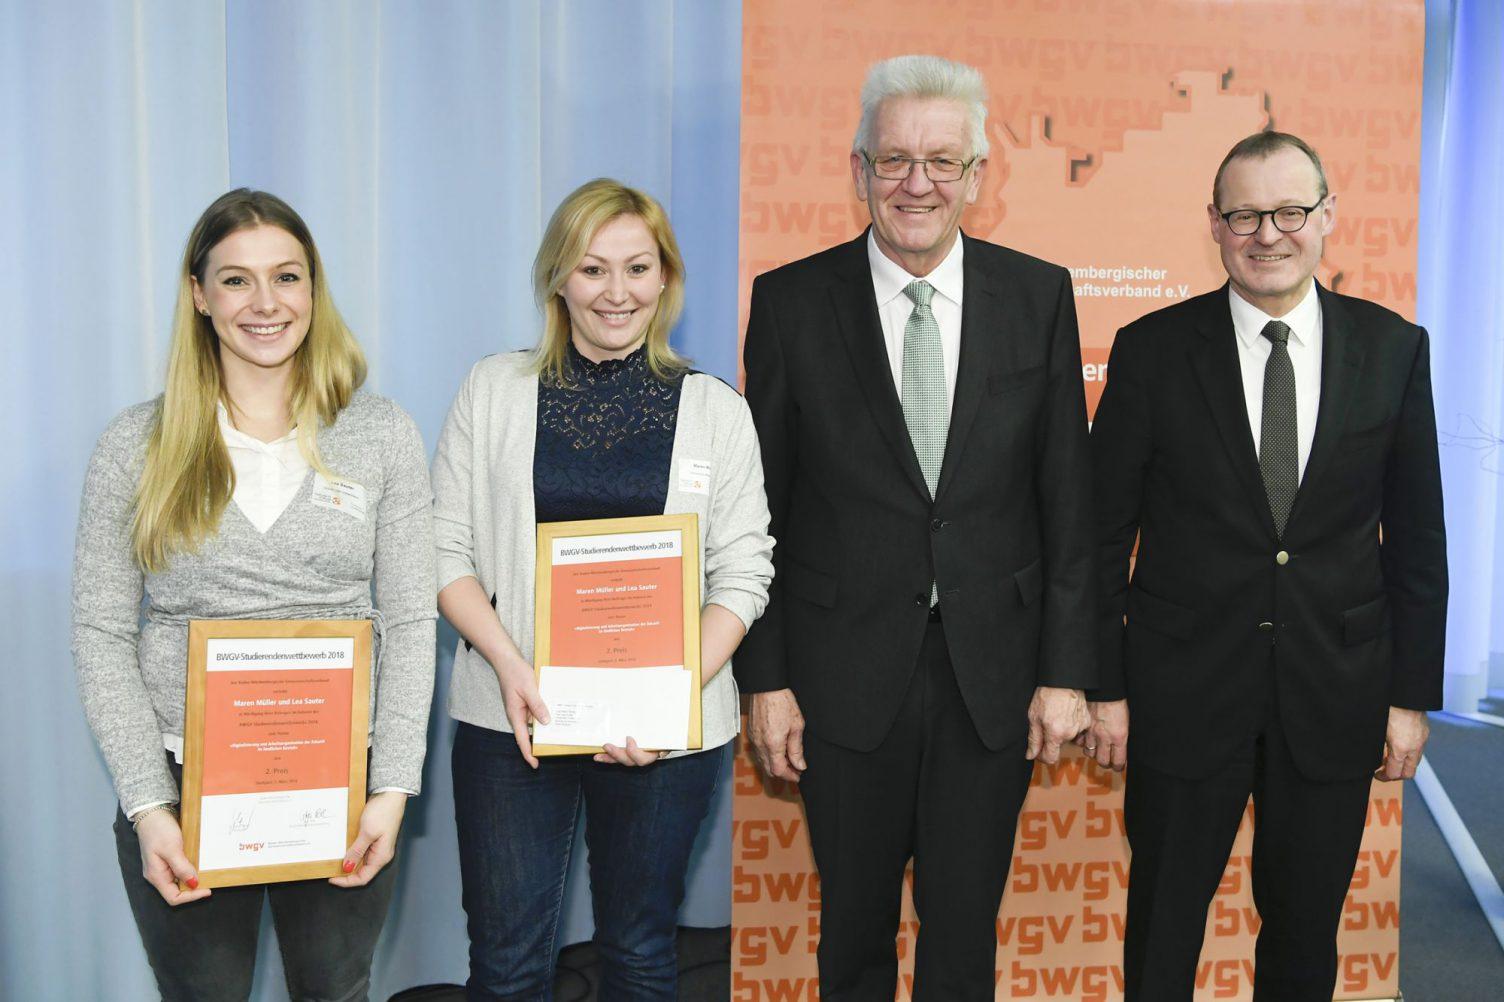 v.l.n.r: Lea Sauter, Maren Müller, Ministerpräsident Winfried Kretschmann und Präsident Dr. Roman Glaser. Foto: Baden-Württembergischer Genossenschaftsverband (BWGV)